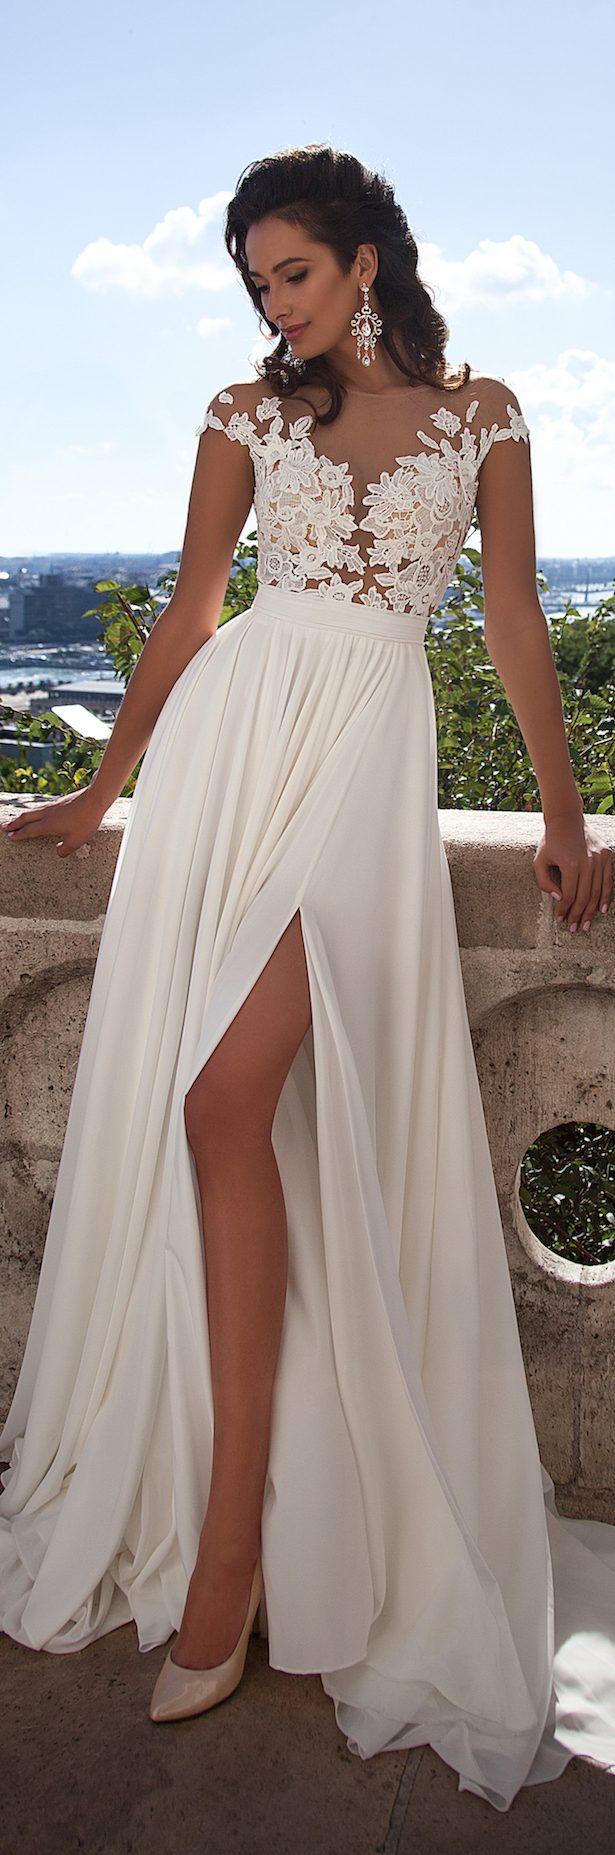 Milla Nova 2016 Bridal Collection Lace beach wedding